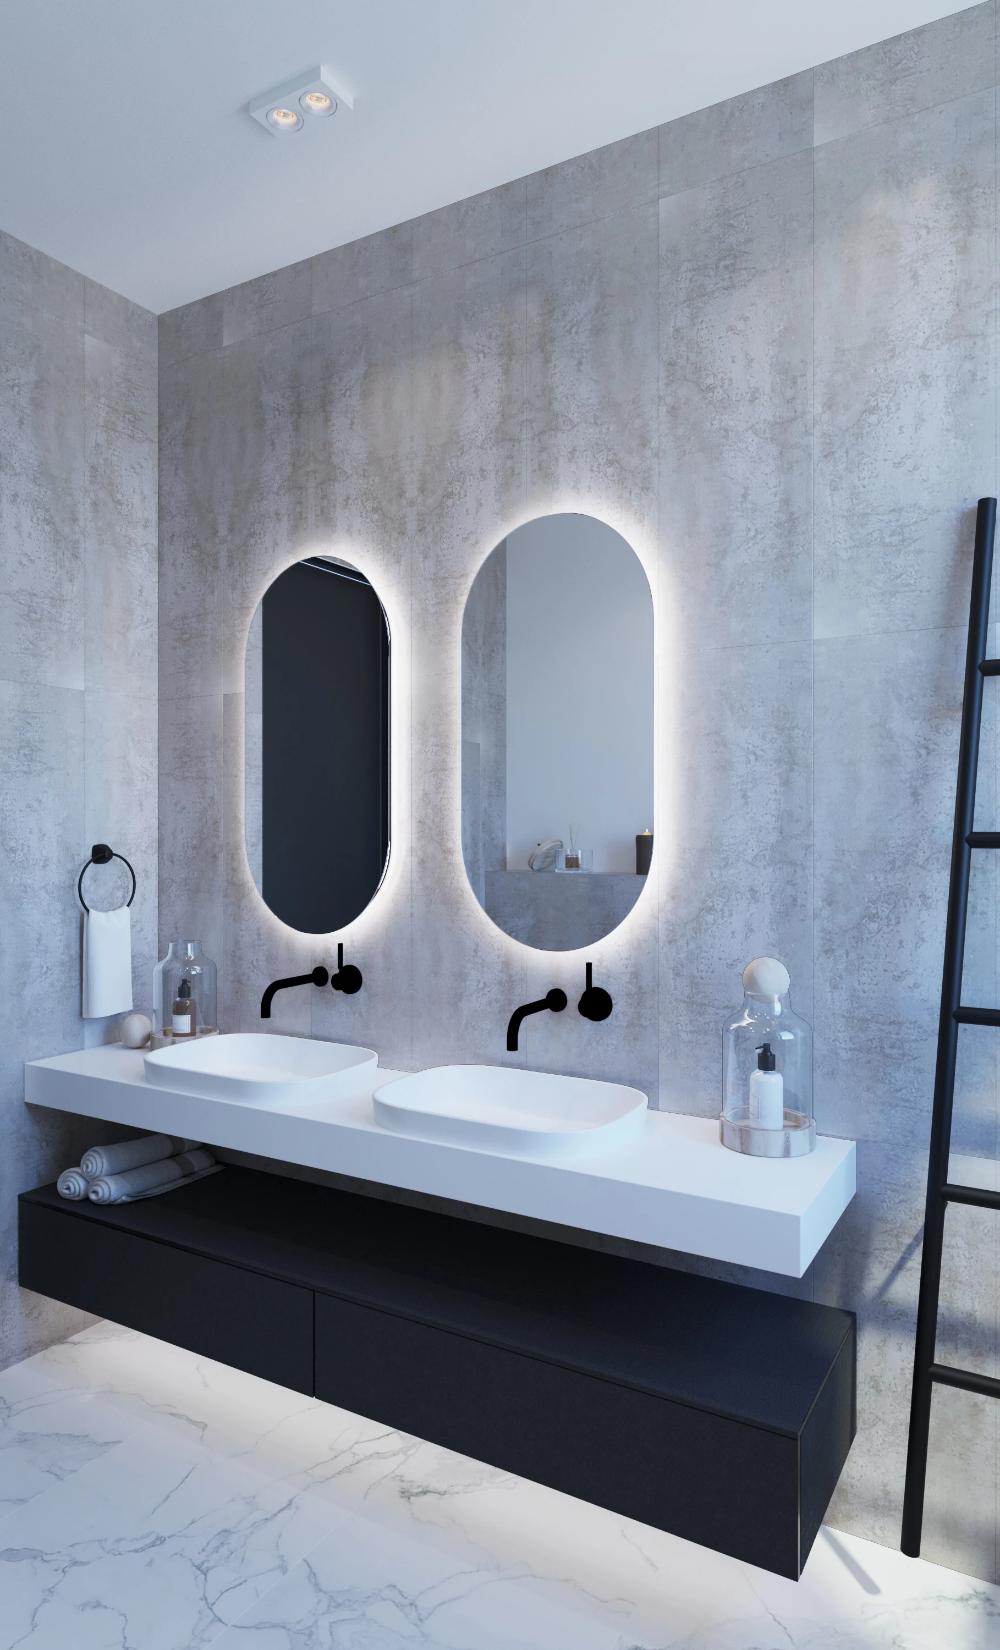 Ablaze Luminous Oval Backlit Bathroom Mirror Shine Mirrors Australia Backlit Bathroom Mirror Bathroom Mirror Round Mirror Bathroom